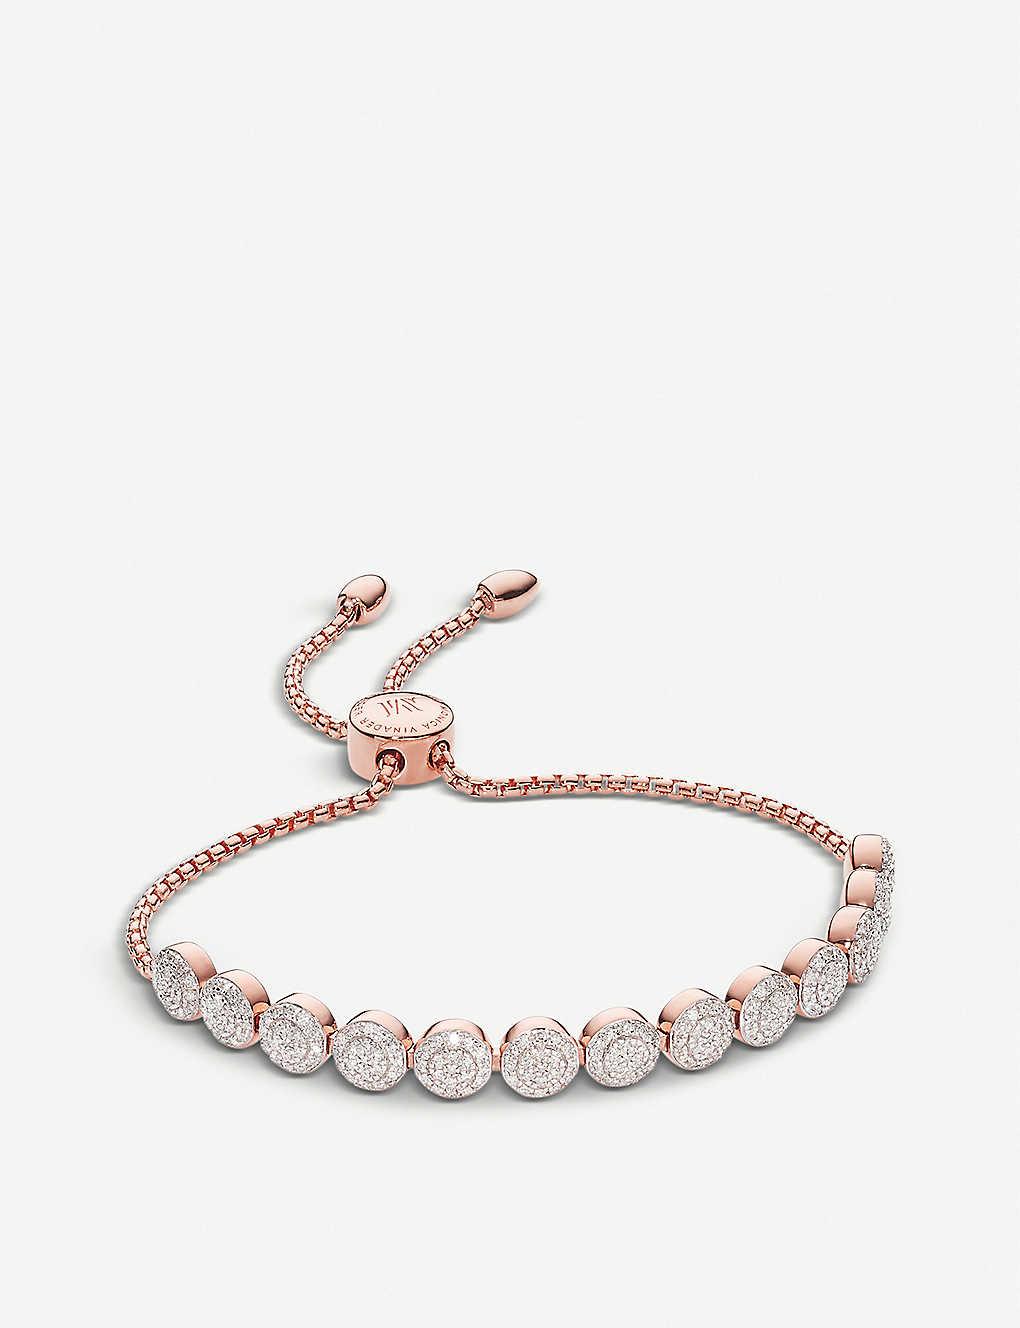 Gold Fiji Button Friendship Chain Bracelet Diamond Monica Vinader ROprY6Tl